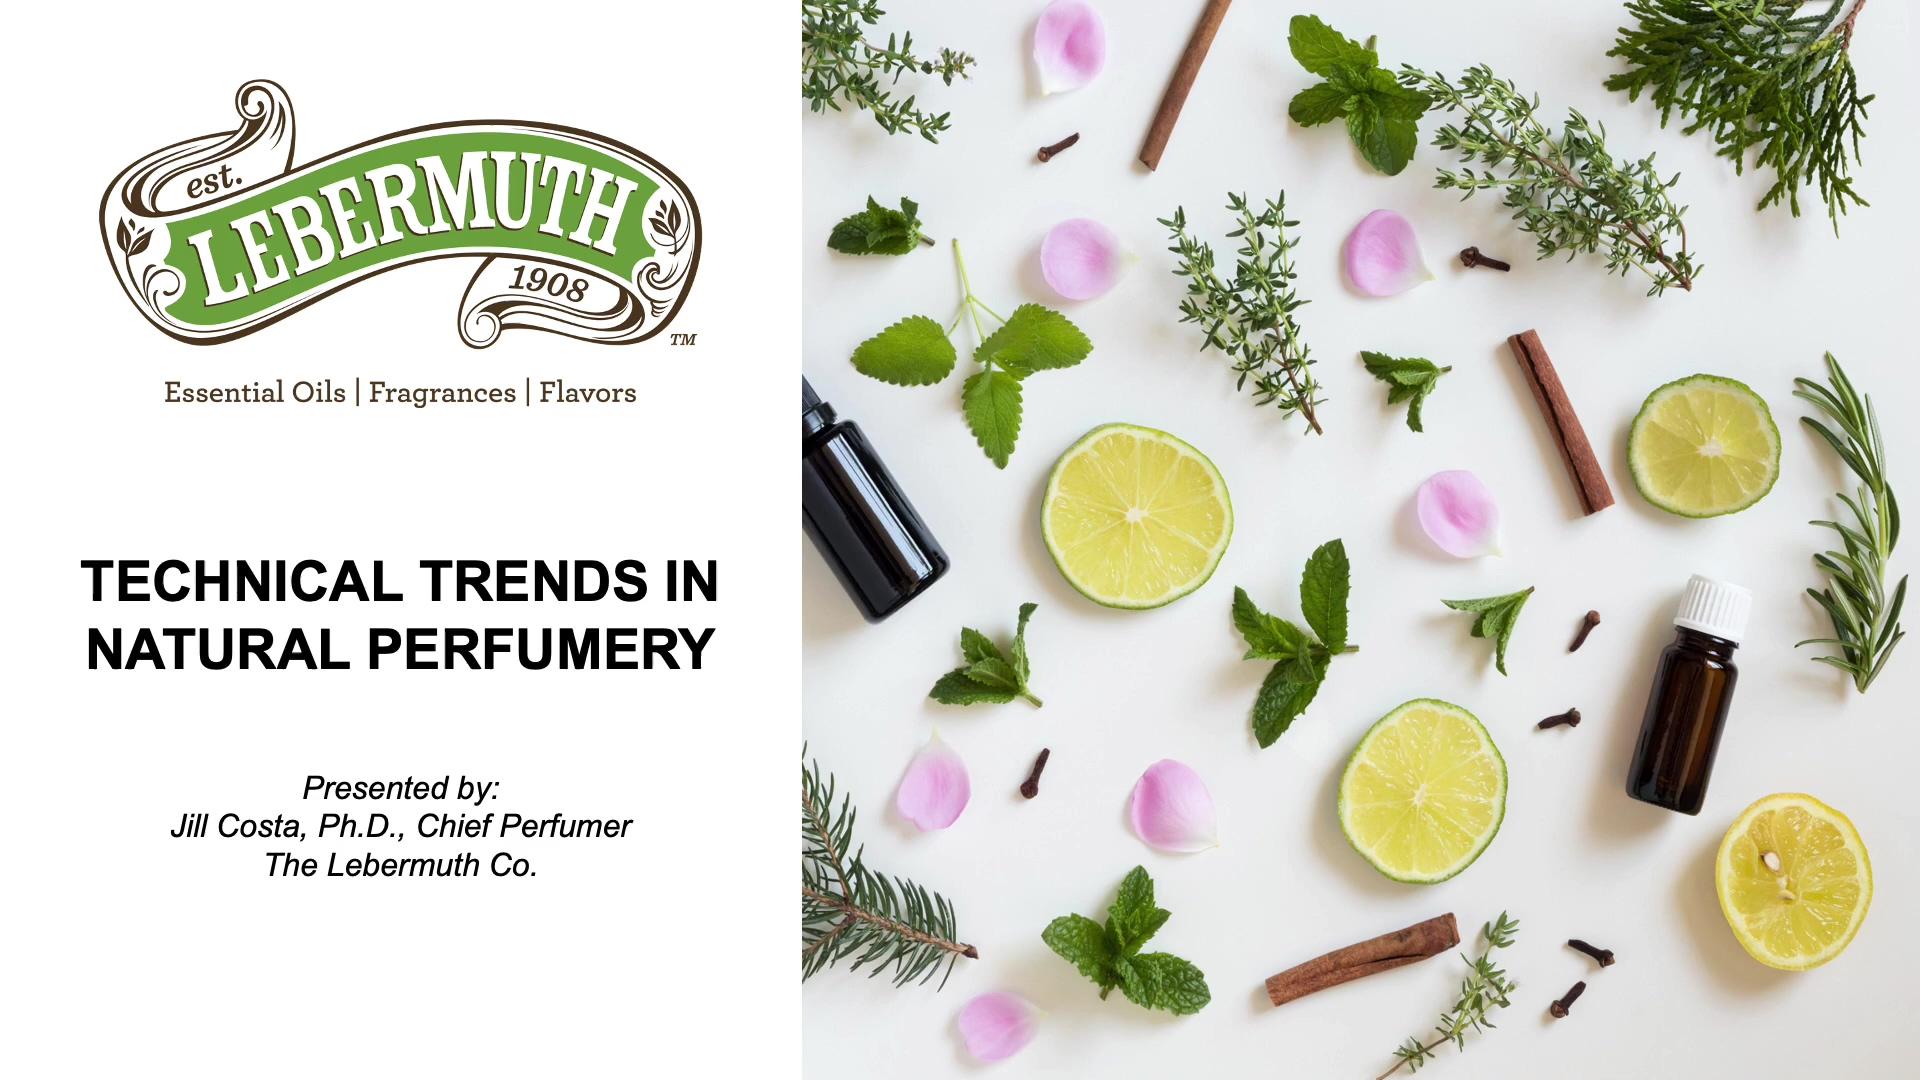 Lebermuth Technical Trends In Perfumery Presentation-1